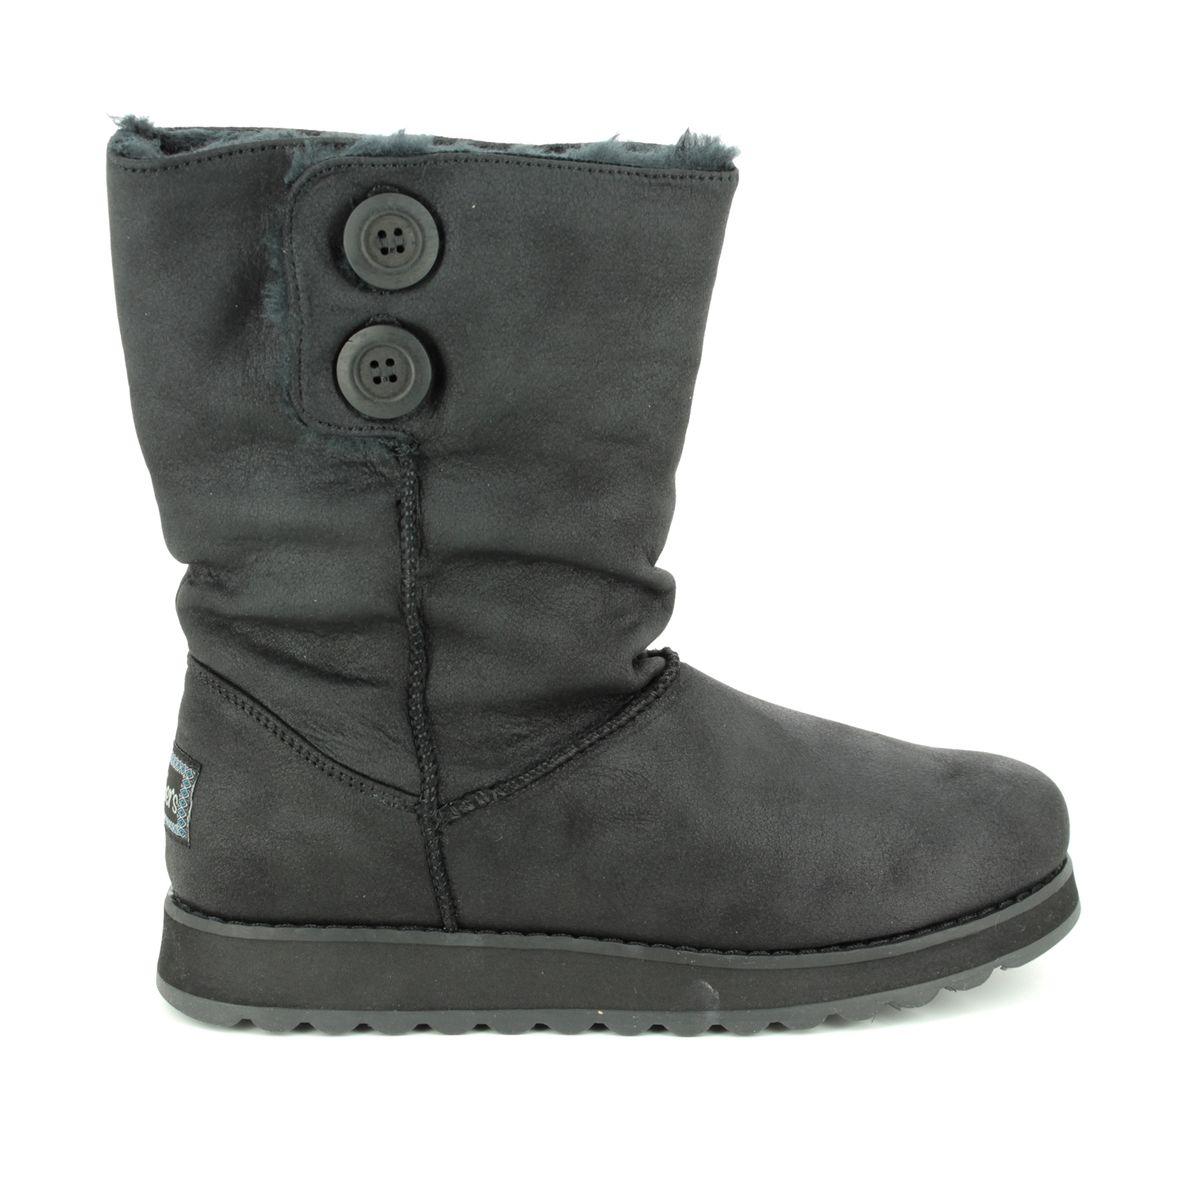 15a32df3b Skechers Keepsakes 2.0 44933 BLK Black knee-high boots